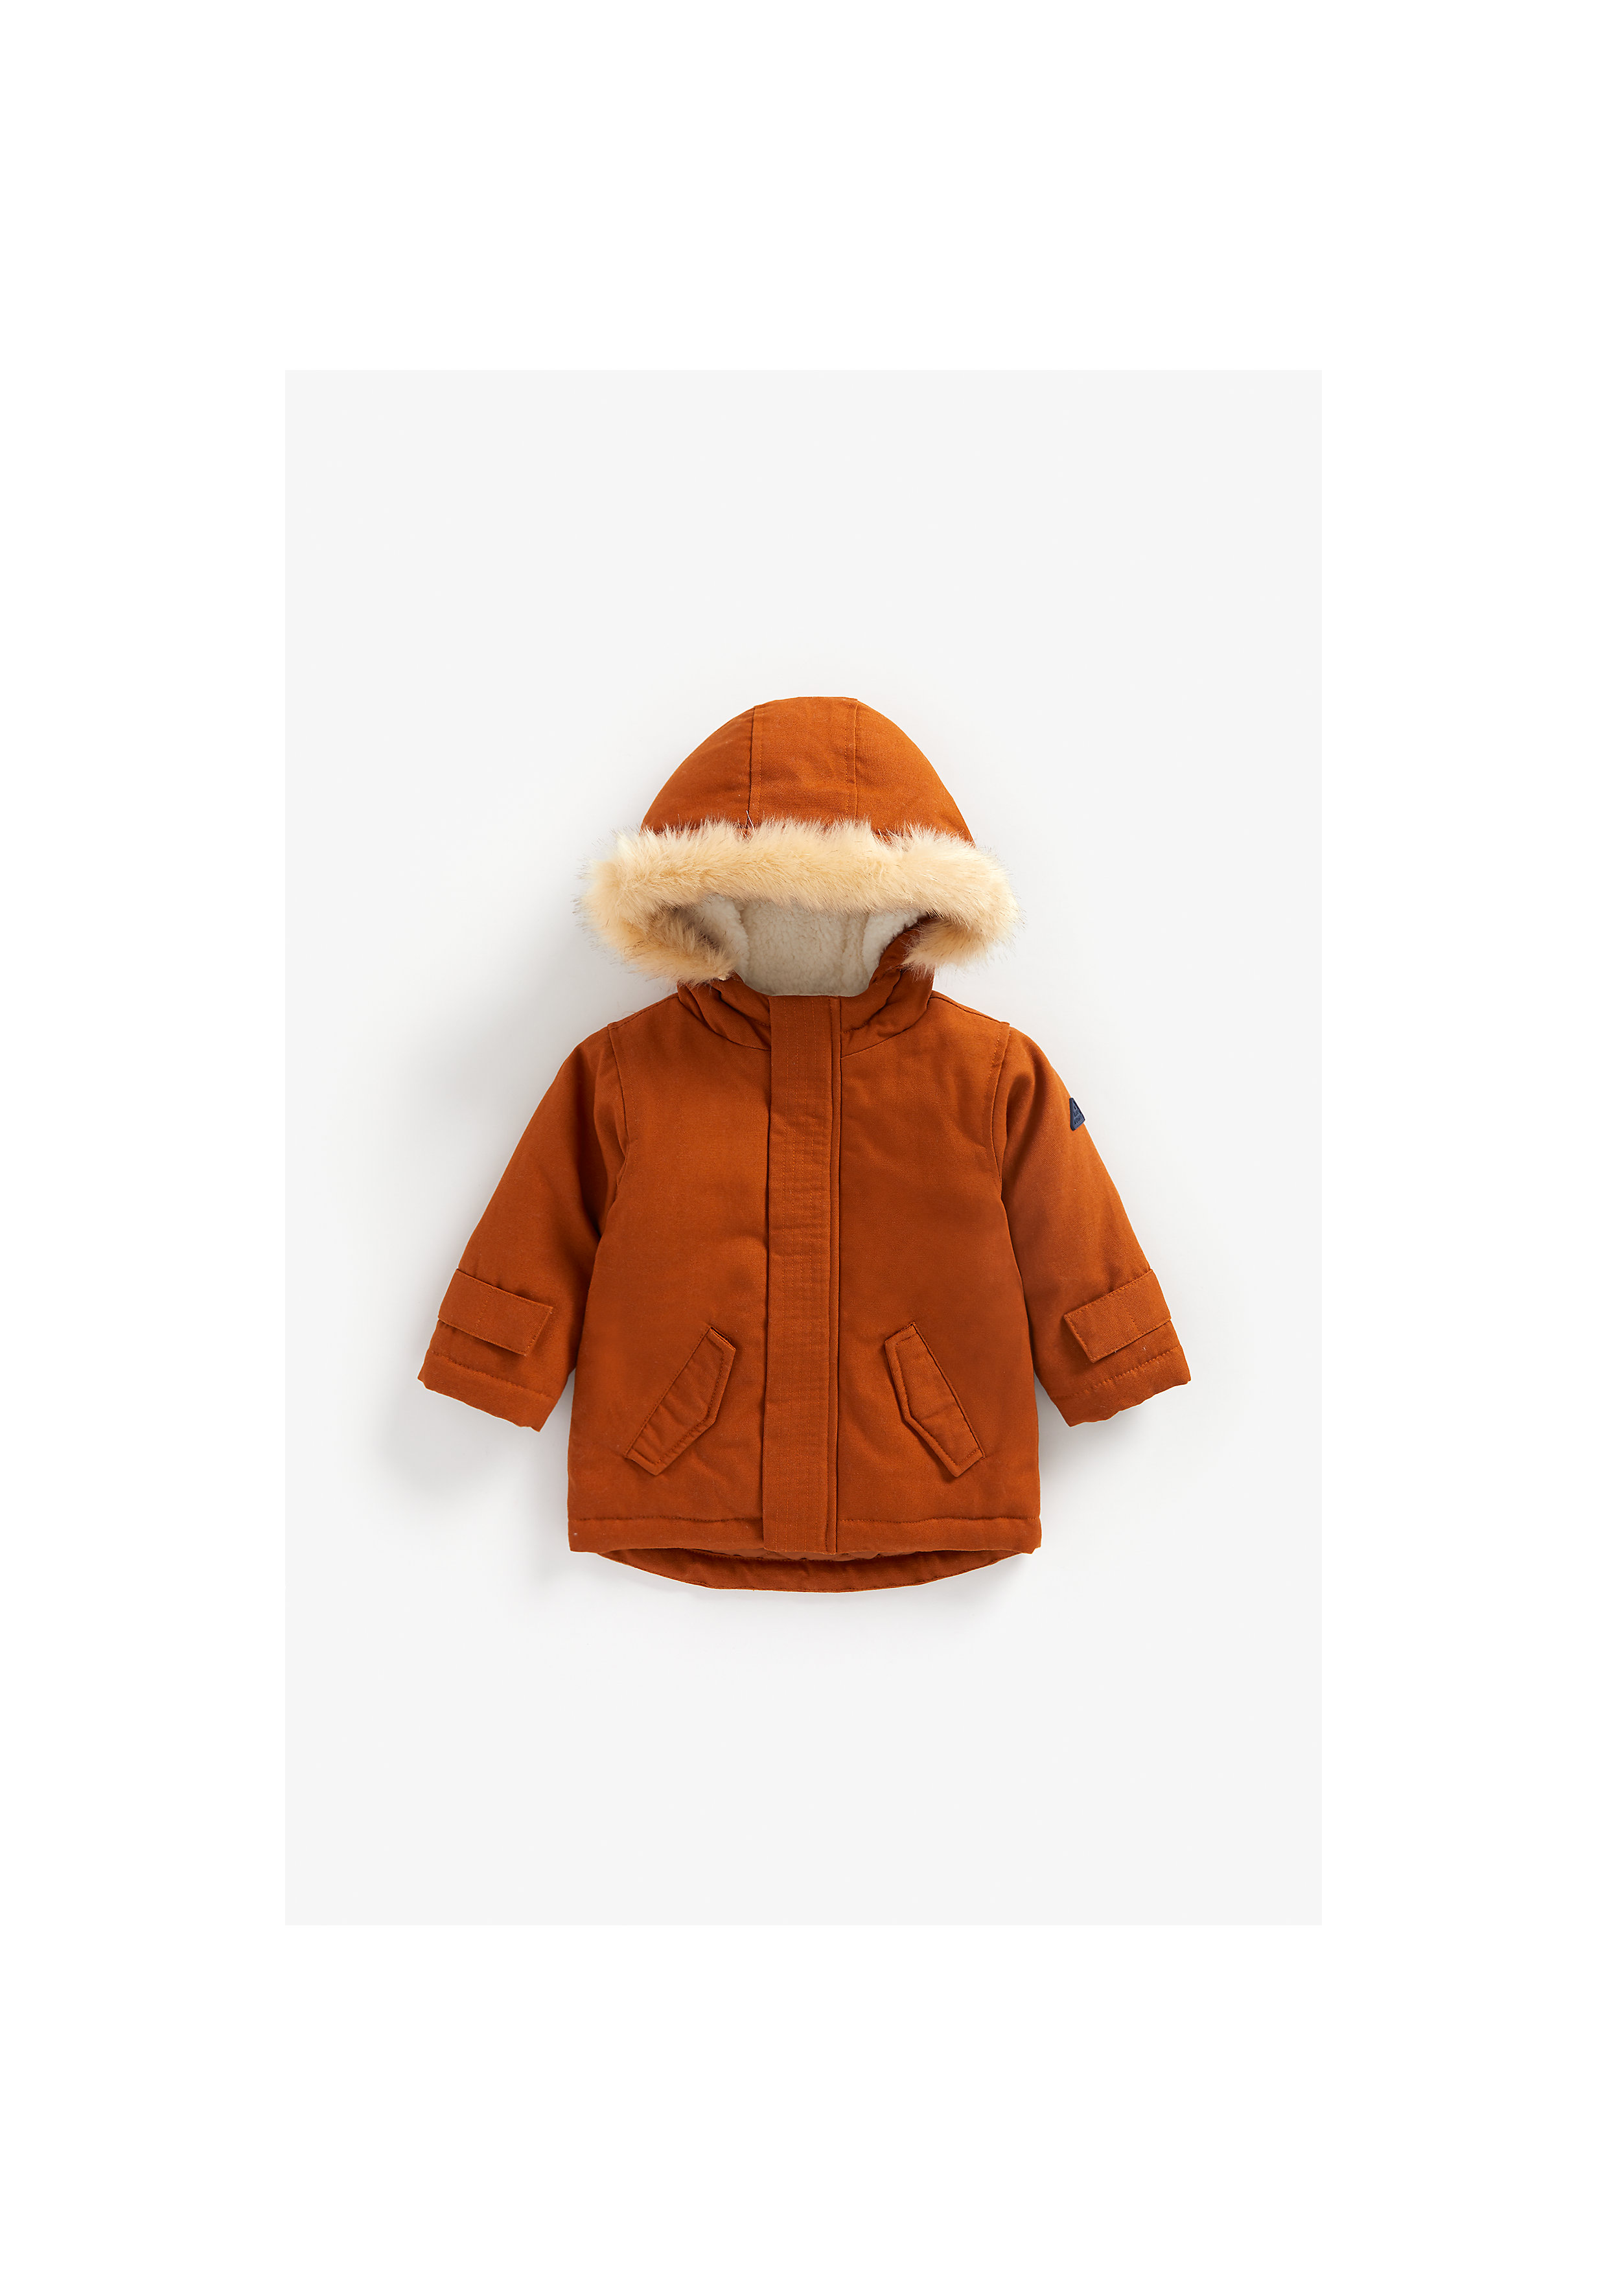 Mothercare | Boys Full Sleeves Fleece Lined Jacket Hooded - Brown